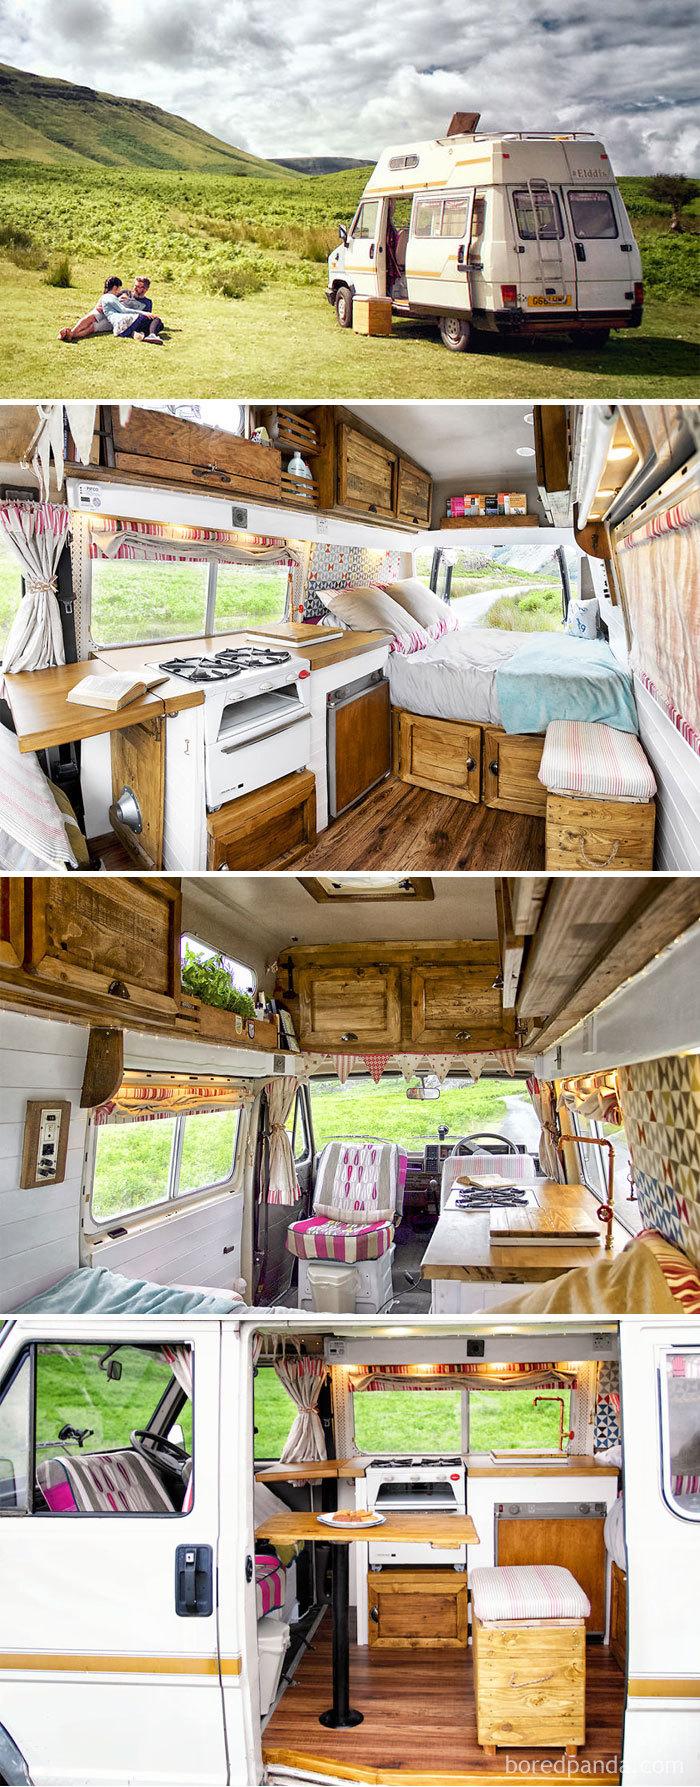 We Transformed This Camper Van In 6 Weeks With Only £1000